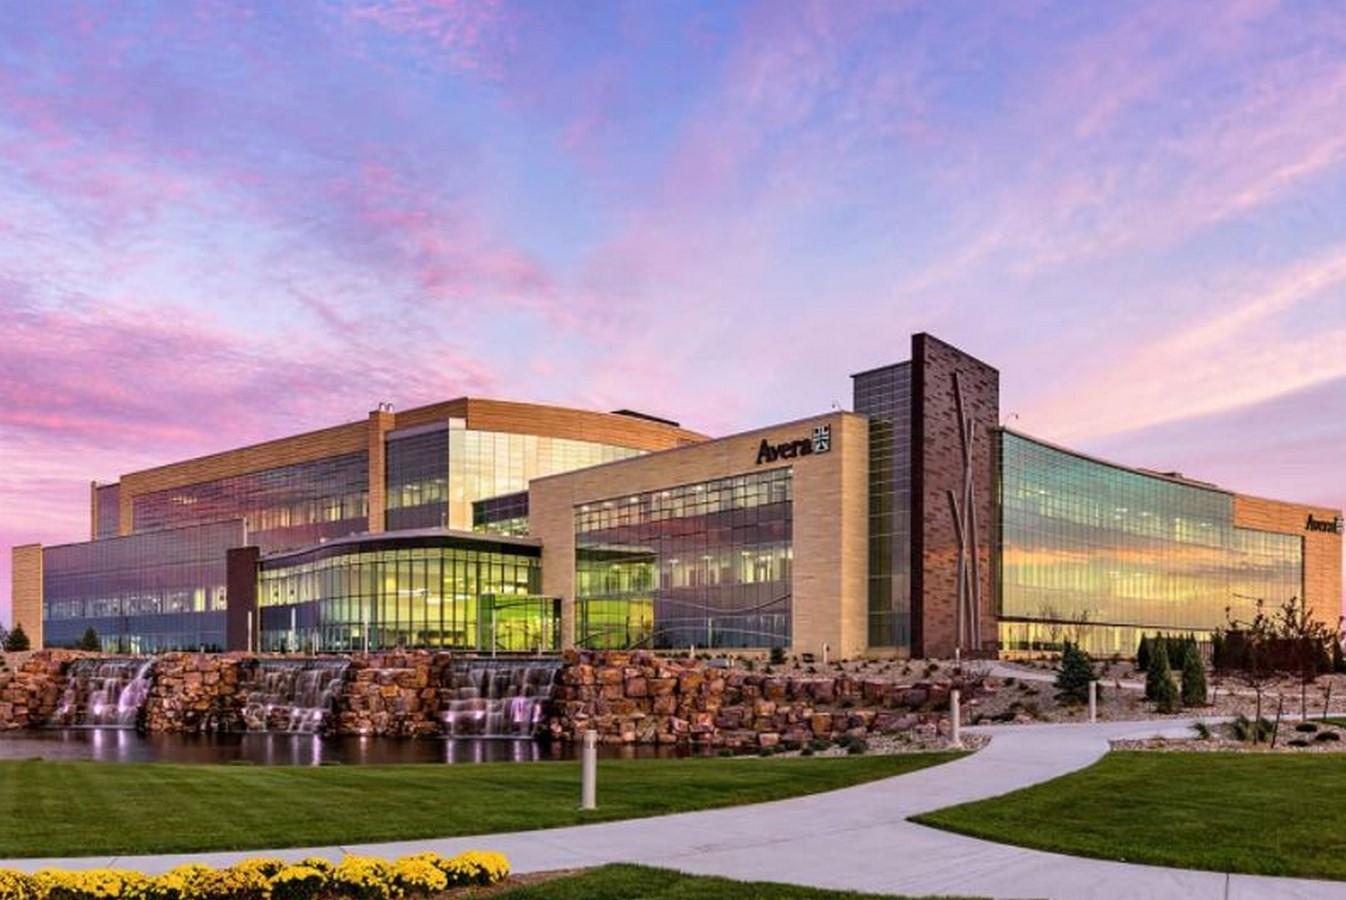 Architects in Omaha - Top 45 Architects in Omaha - Sheet10